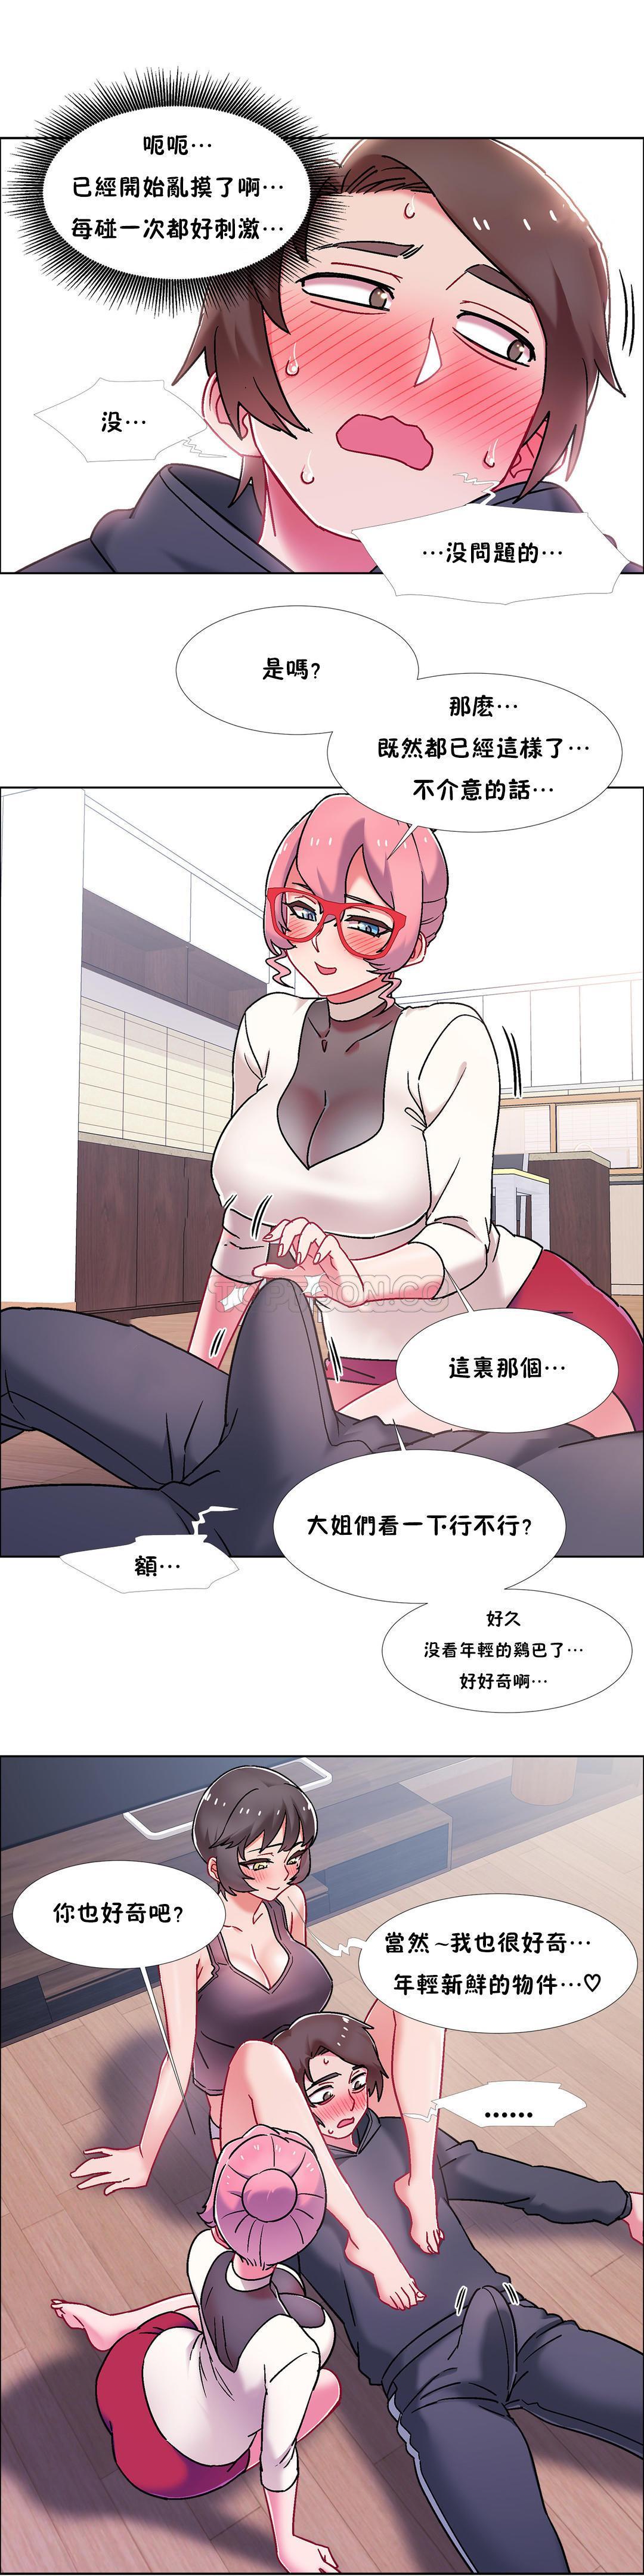 [Studio Wannabe] Rental Girls | 出租女郎 Ch. 33-58 [Chinese]  第二季 完结 333